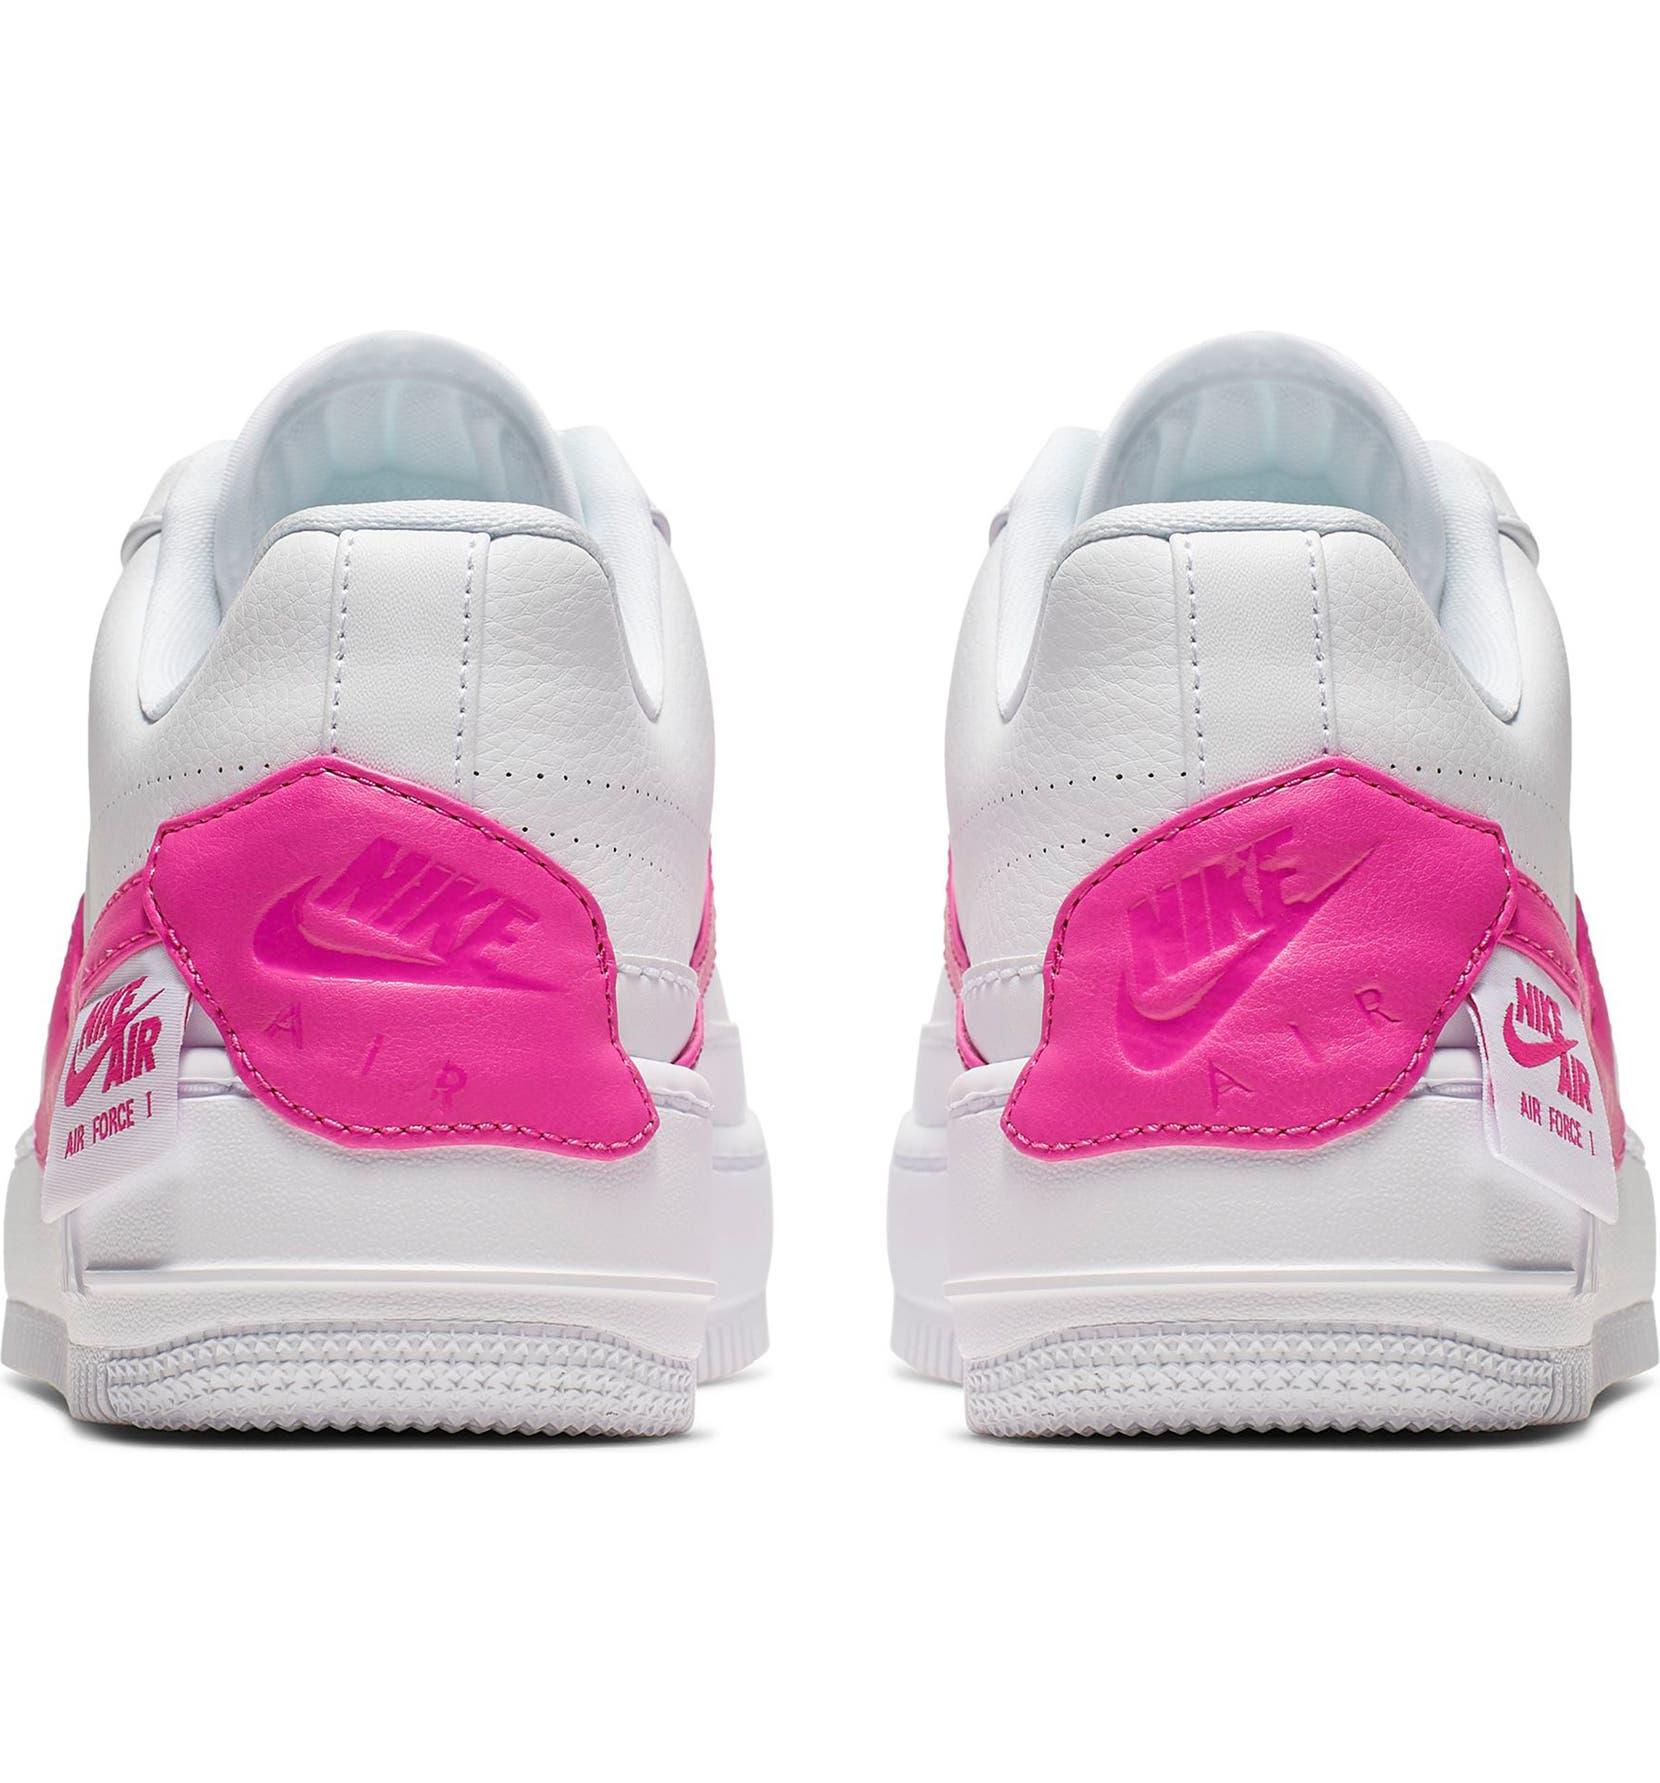 Air Force 1 Jester XX Sneaker